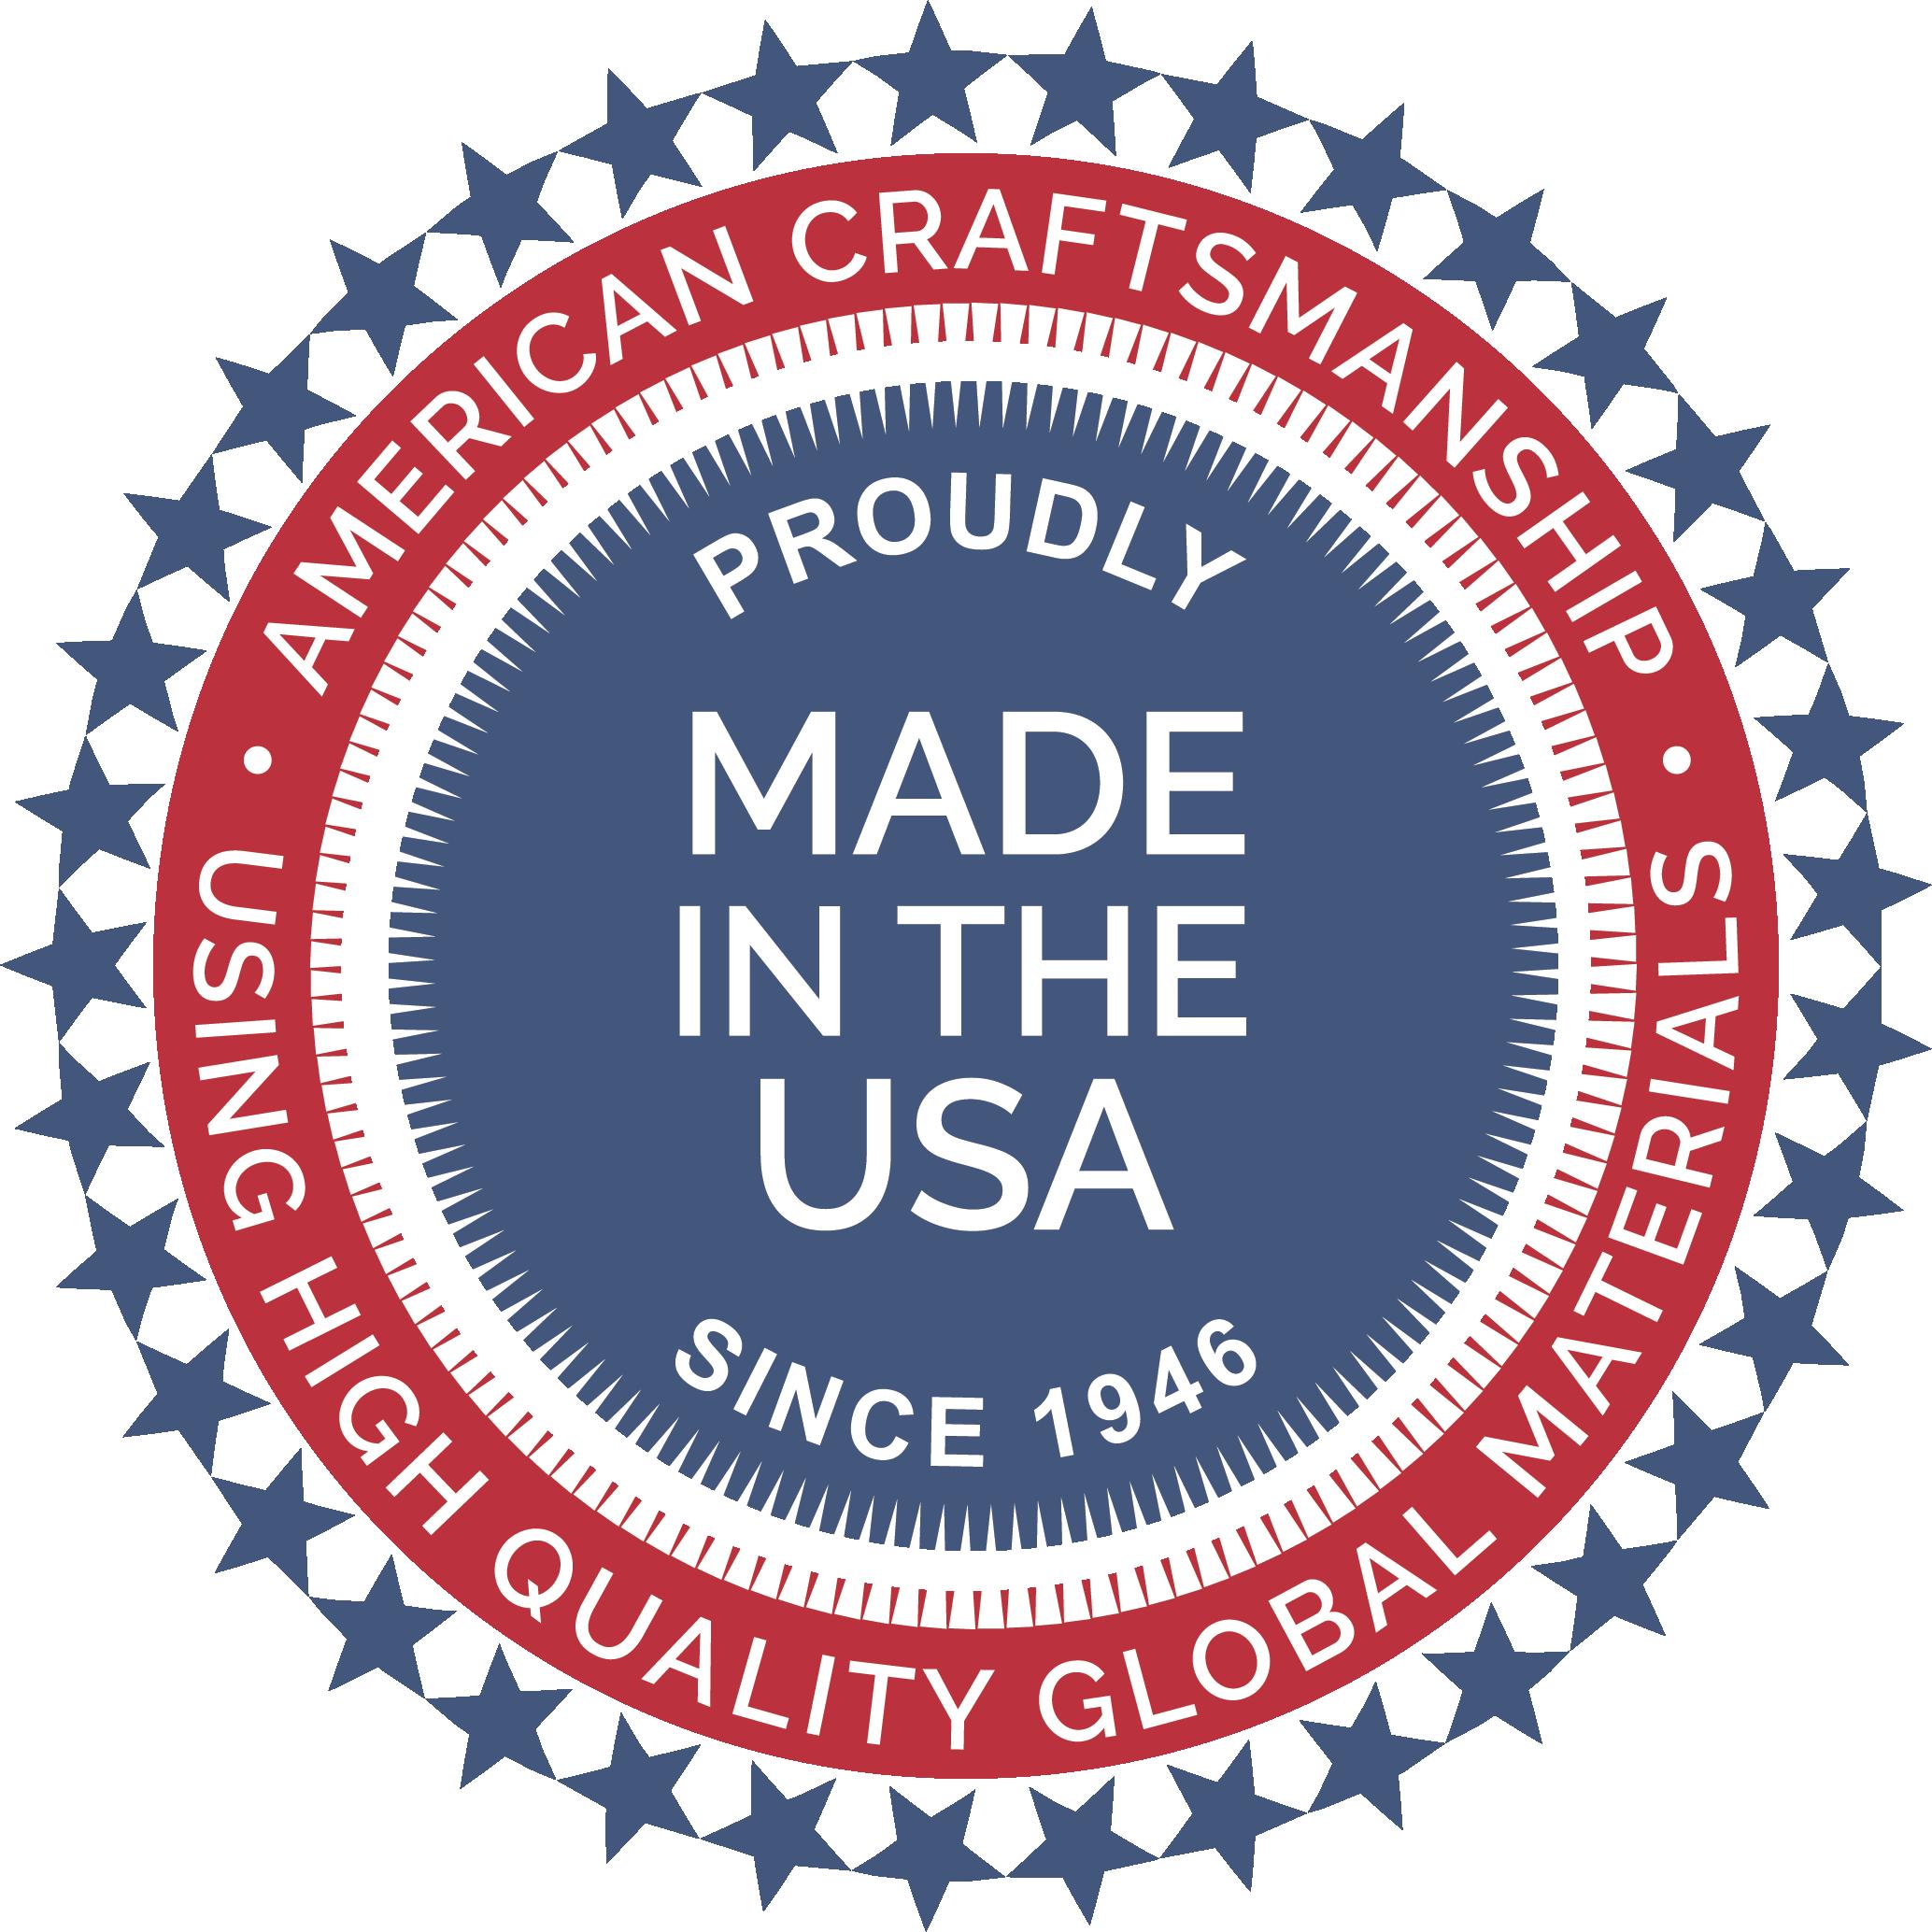 AmericanCraftsmanship